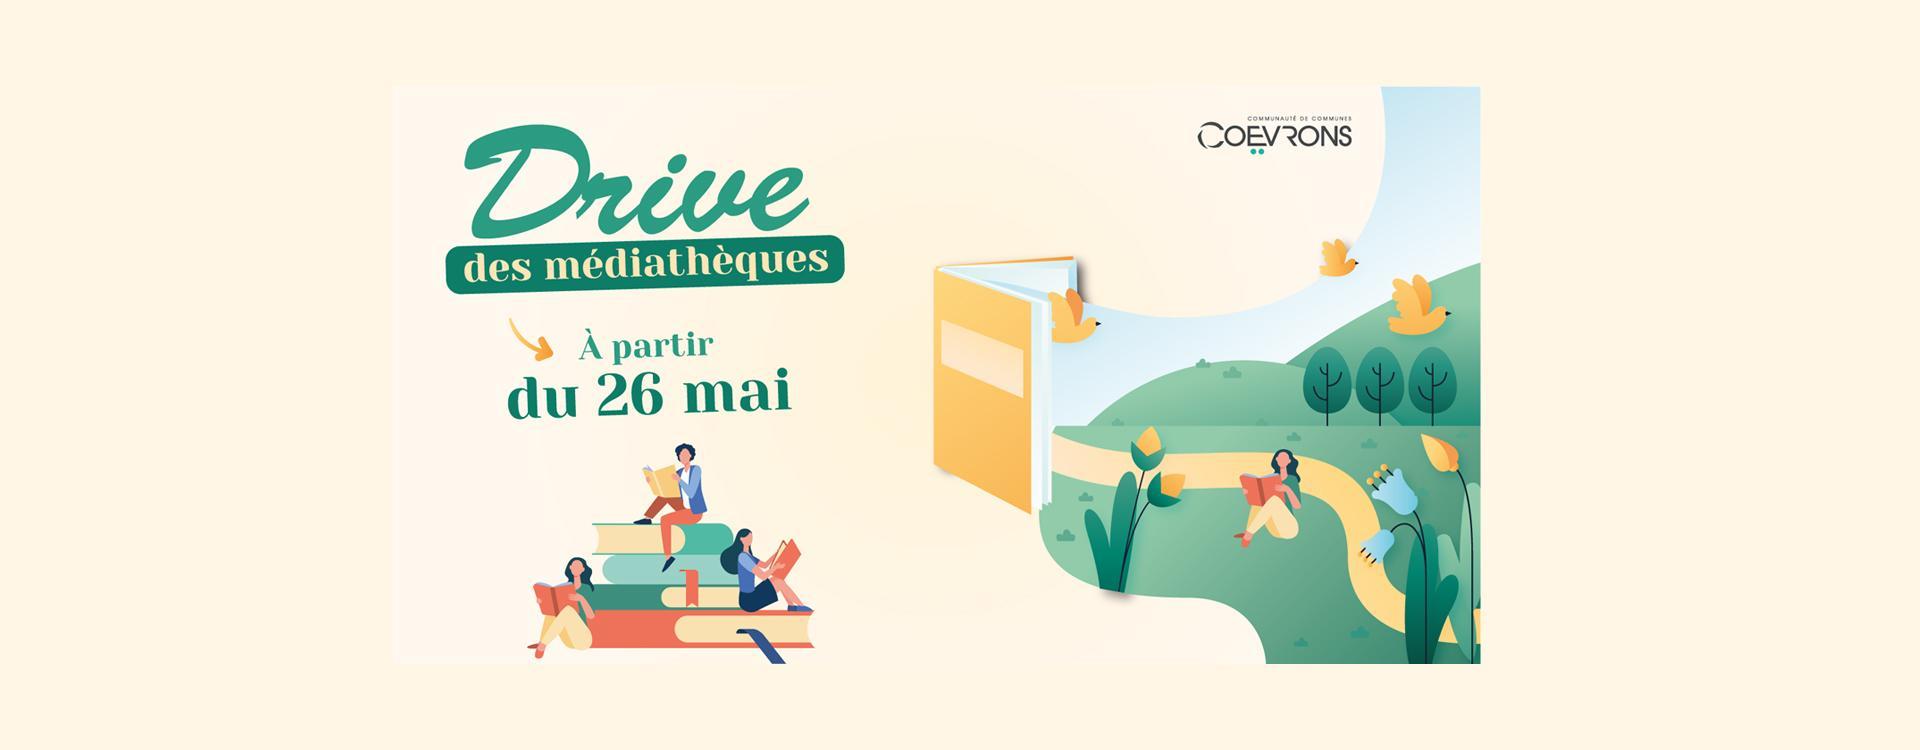 Drive Médiathèque Coevrons Mayenne